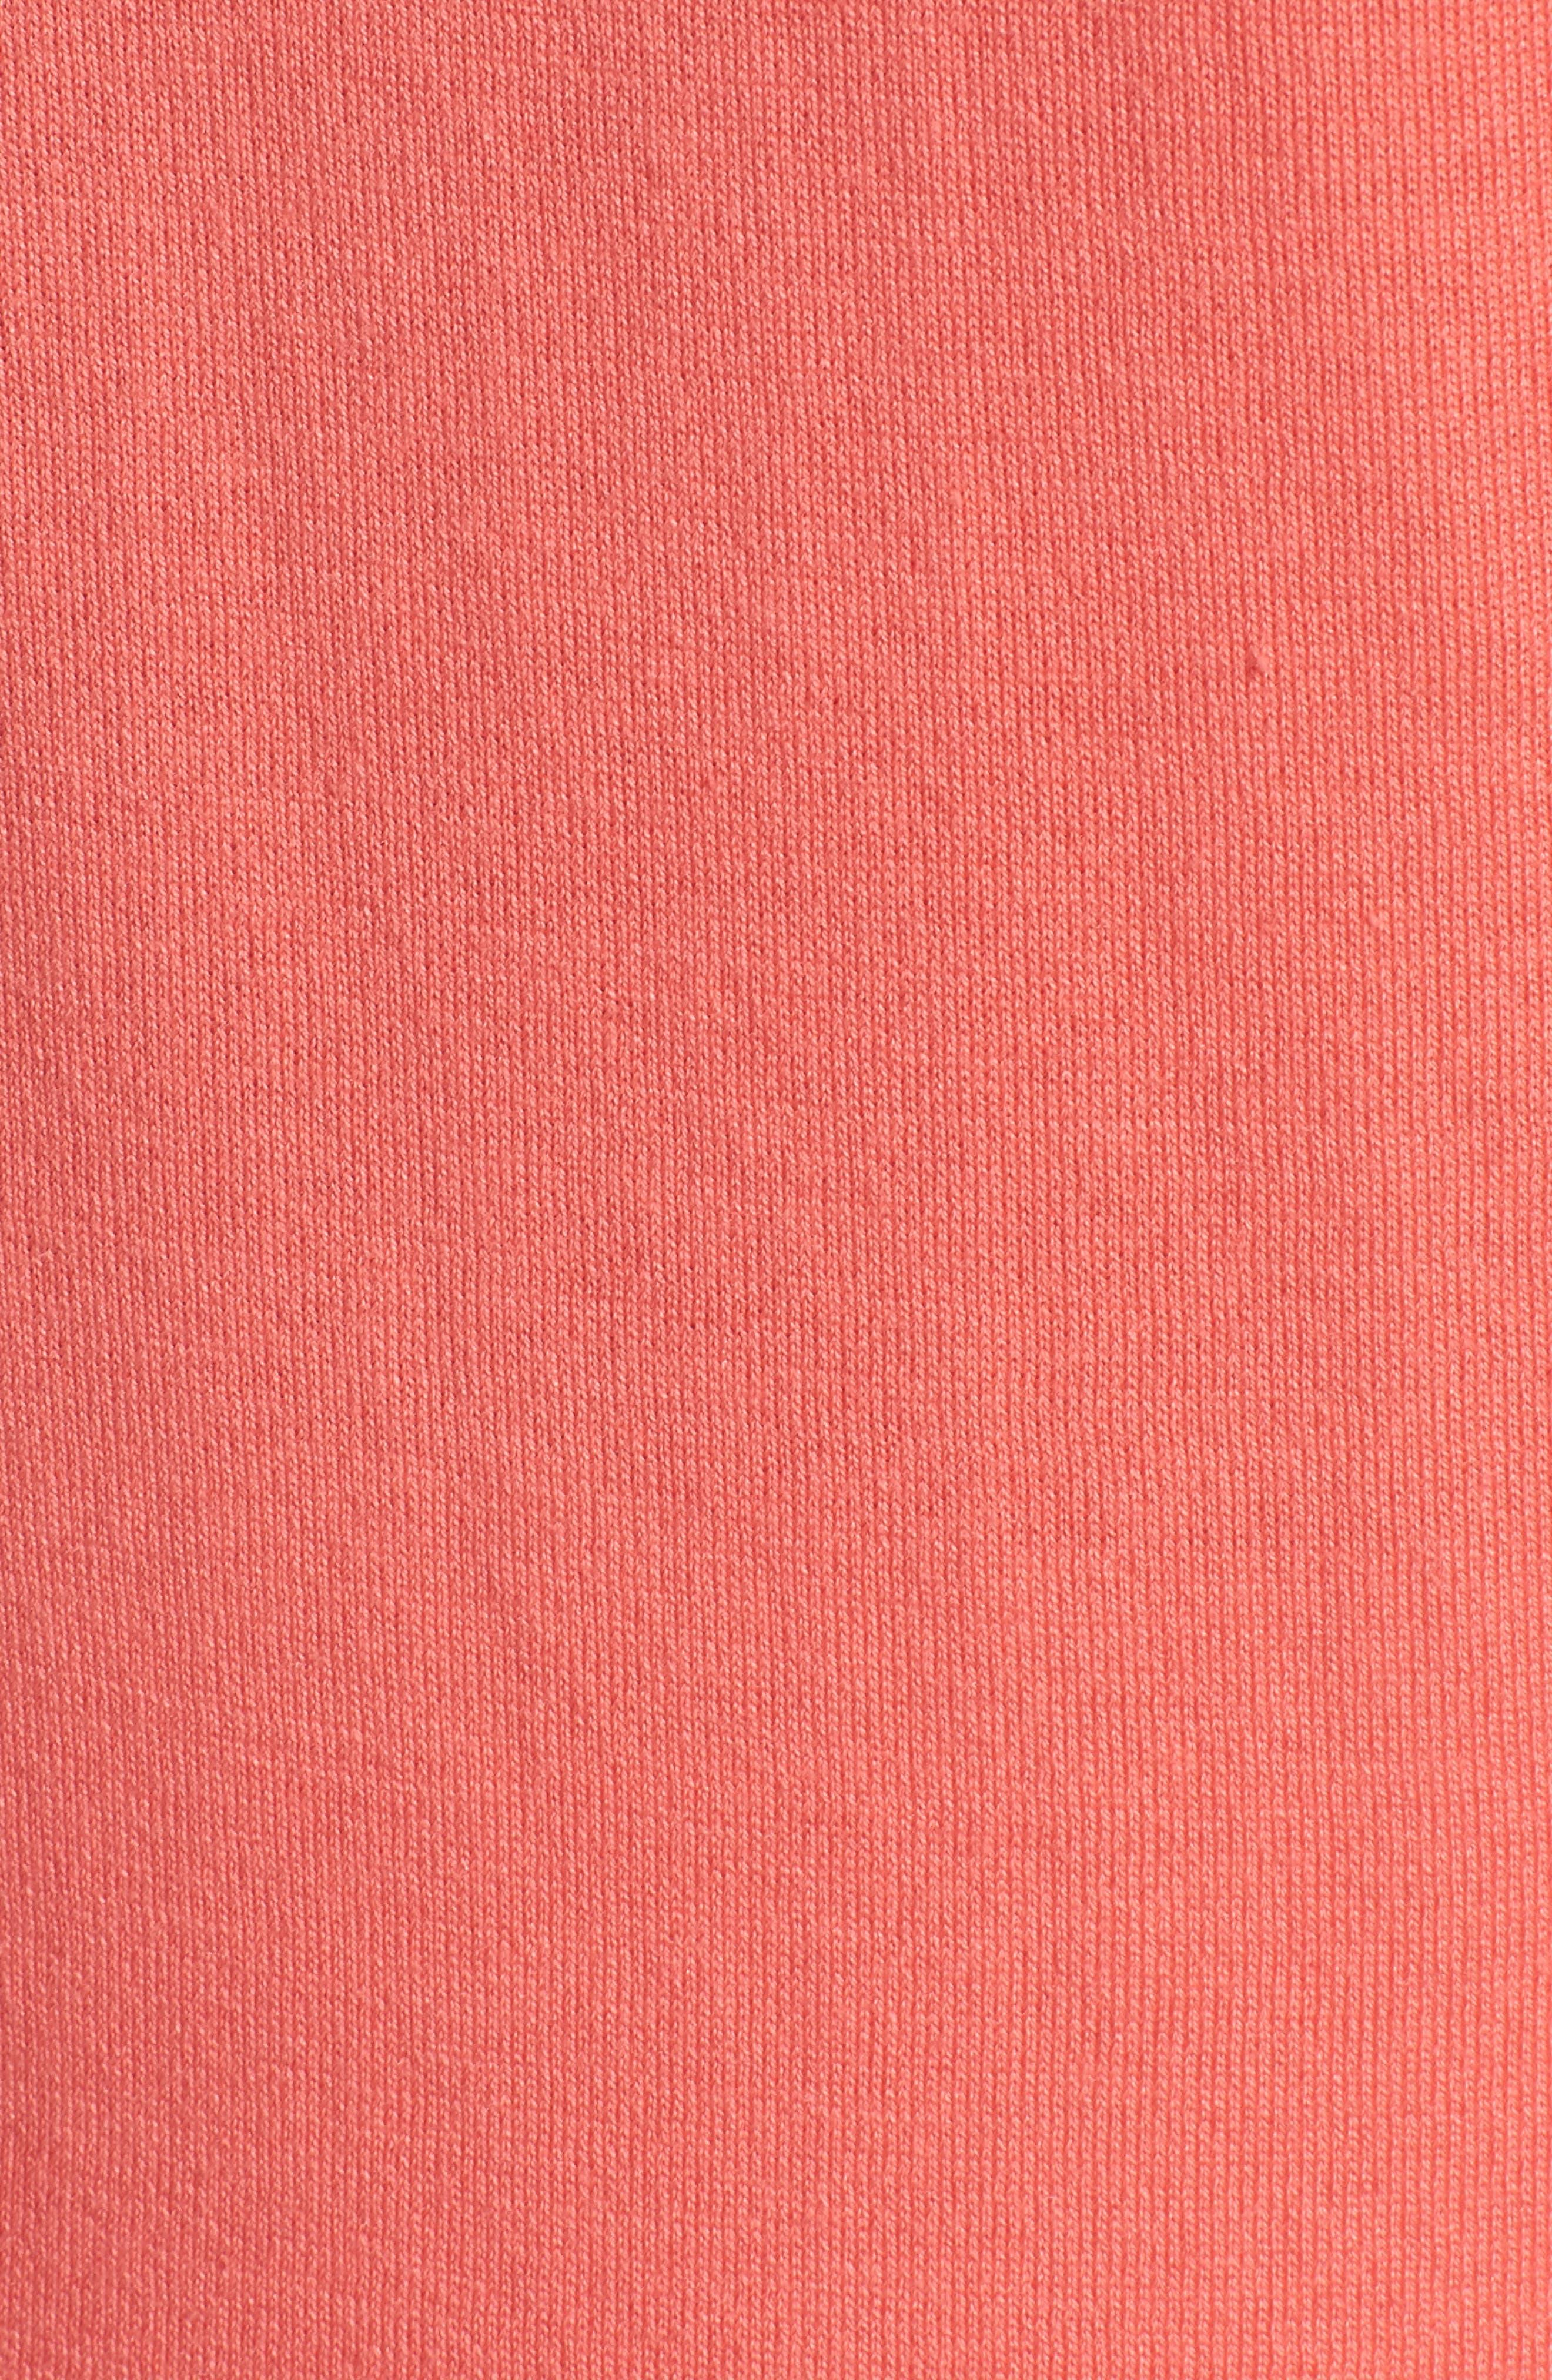 Crewneck Sweater,                             Alternate thumbnail 50, color,